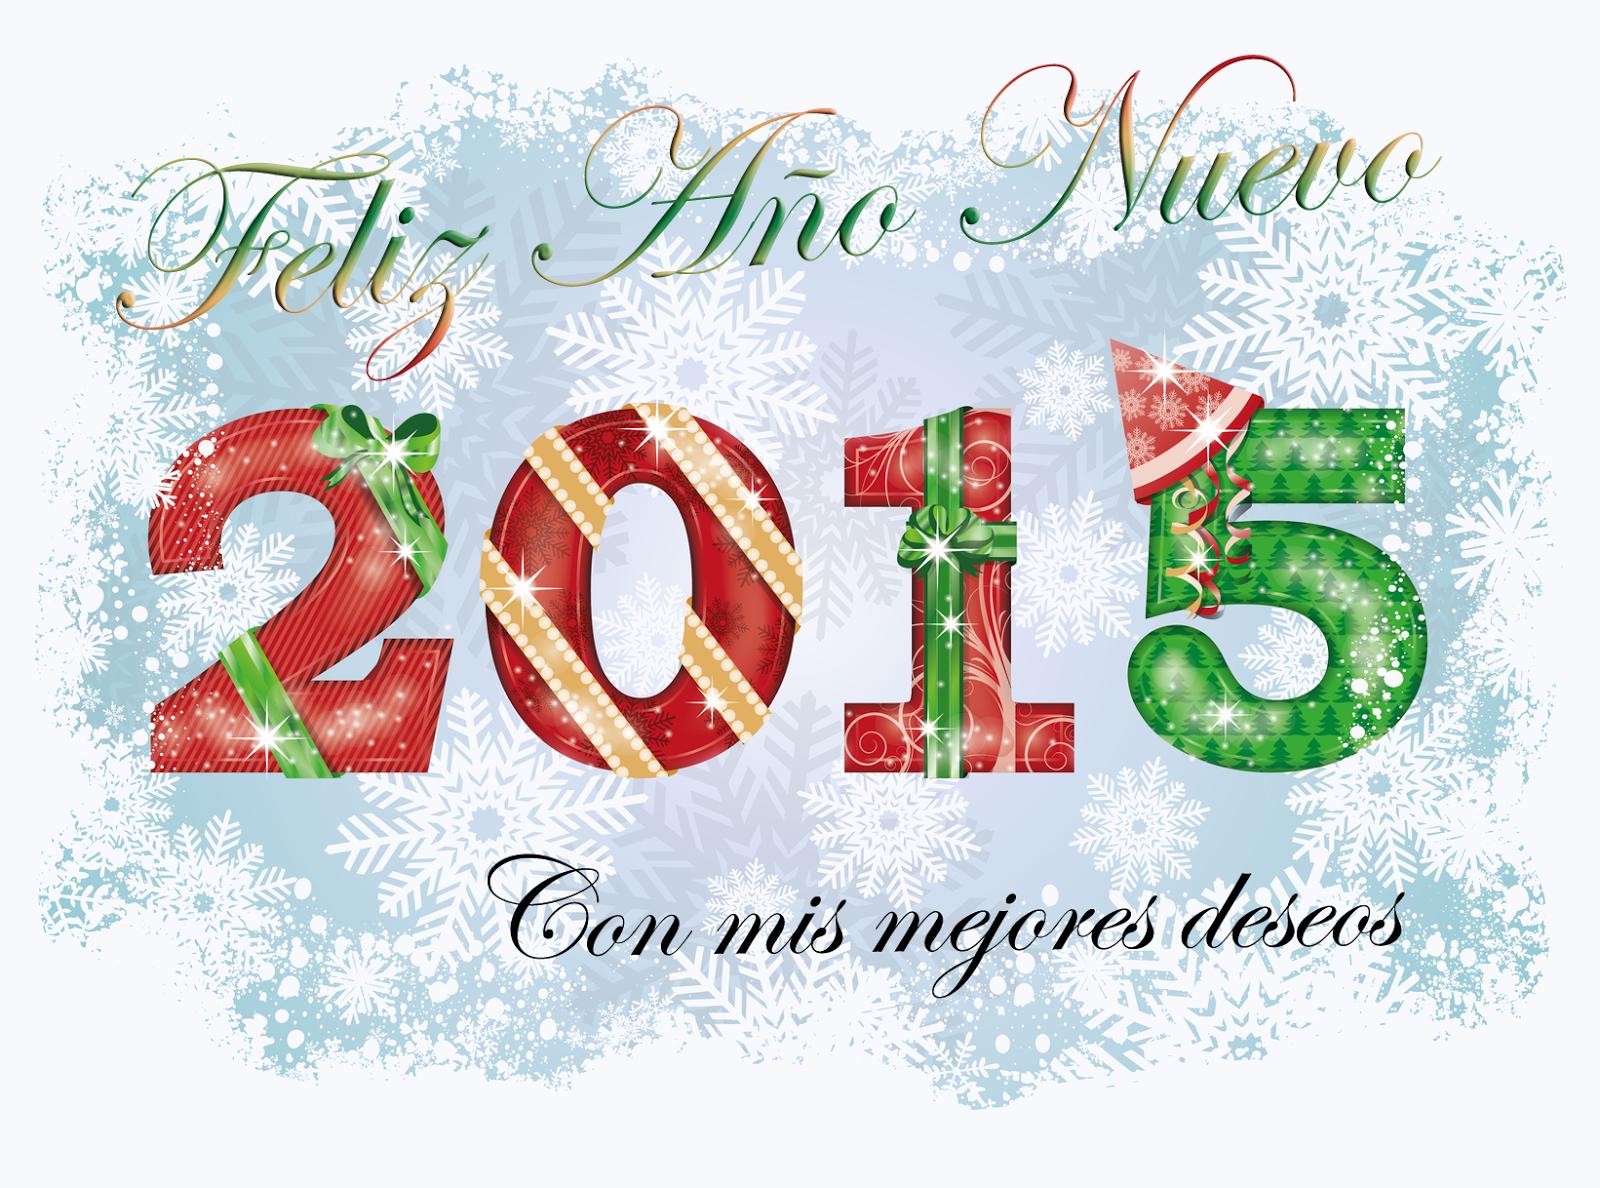 Buenos Días, Tardes, Noches DICIEMBRE 2014  Feliz-a%C3%B1o-nuevo-2015-postal-para-compartir